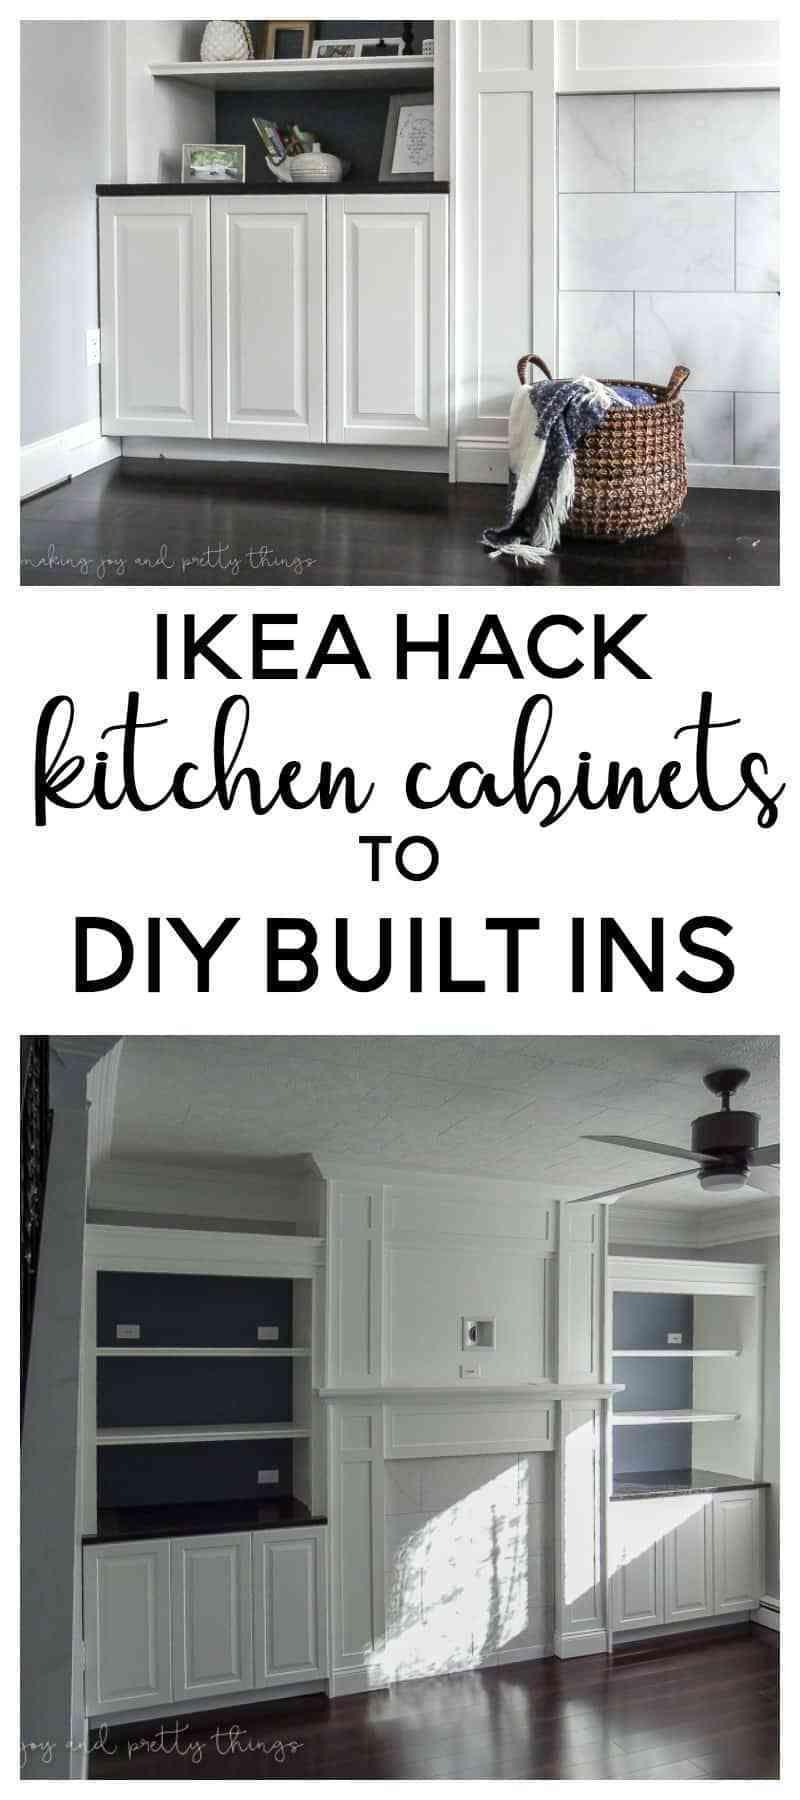 18 room decor Ikea kitchens ideas